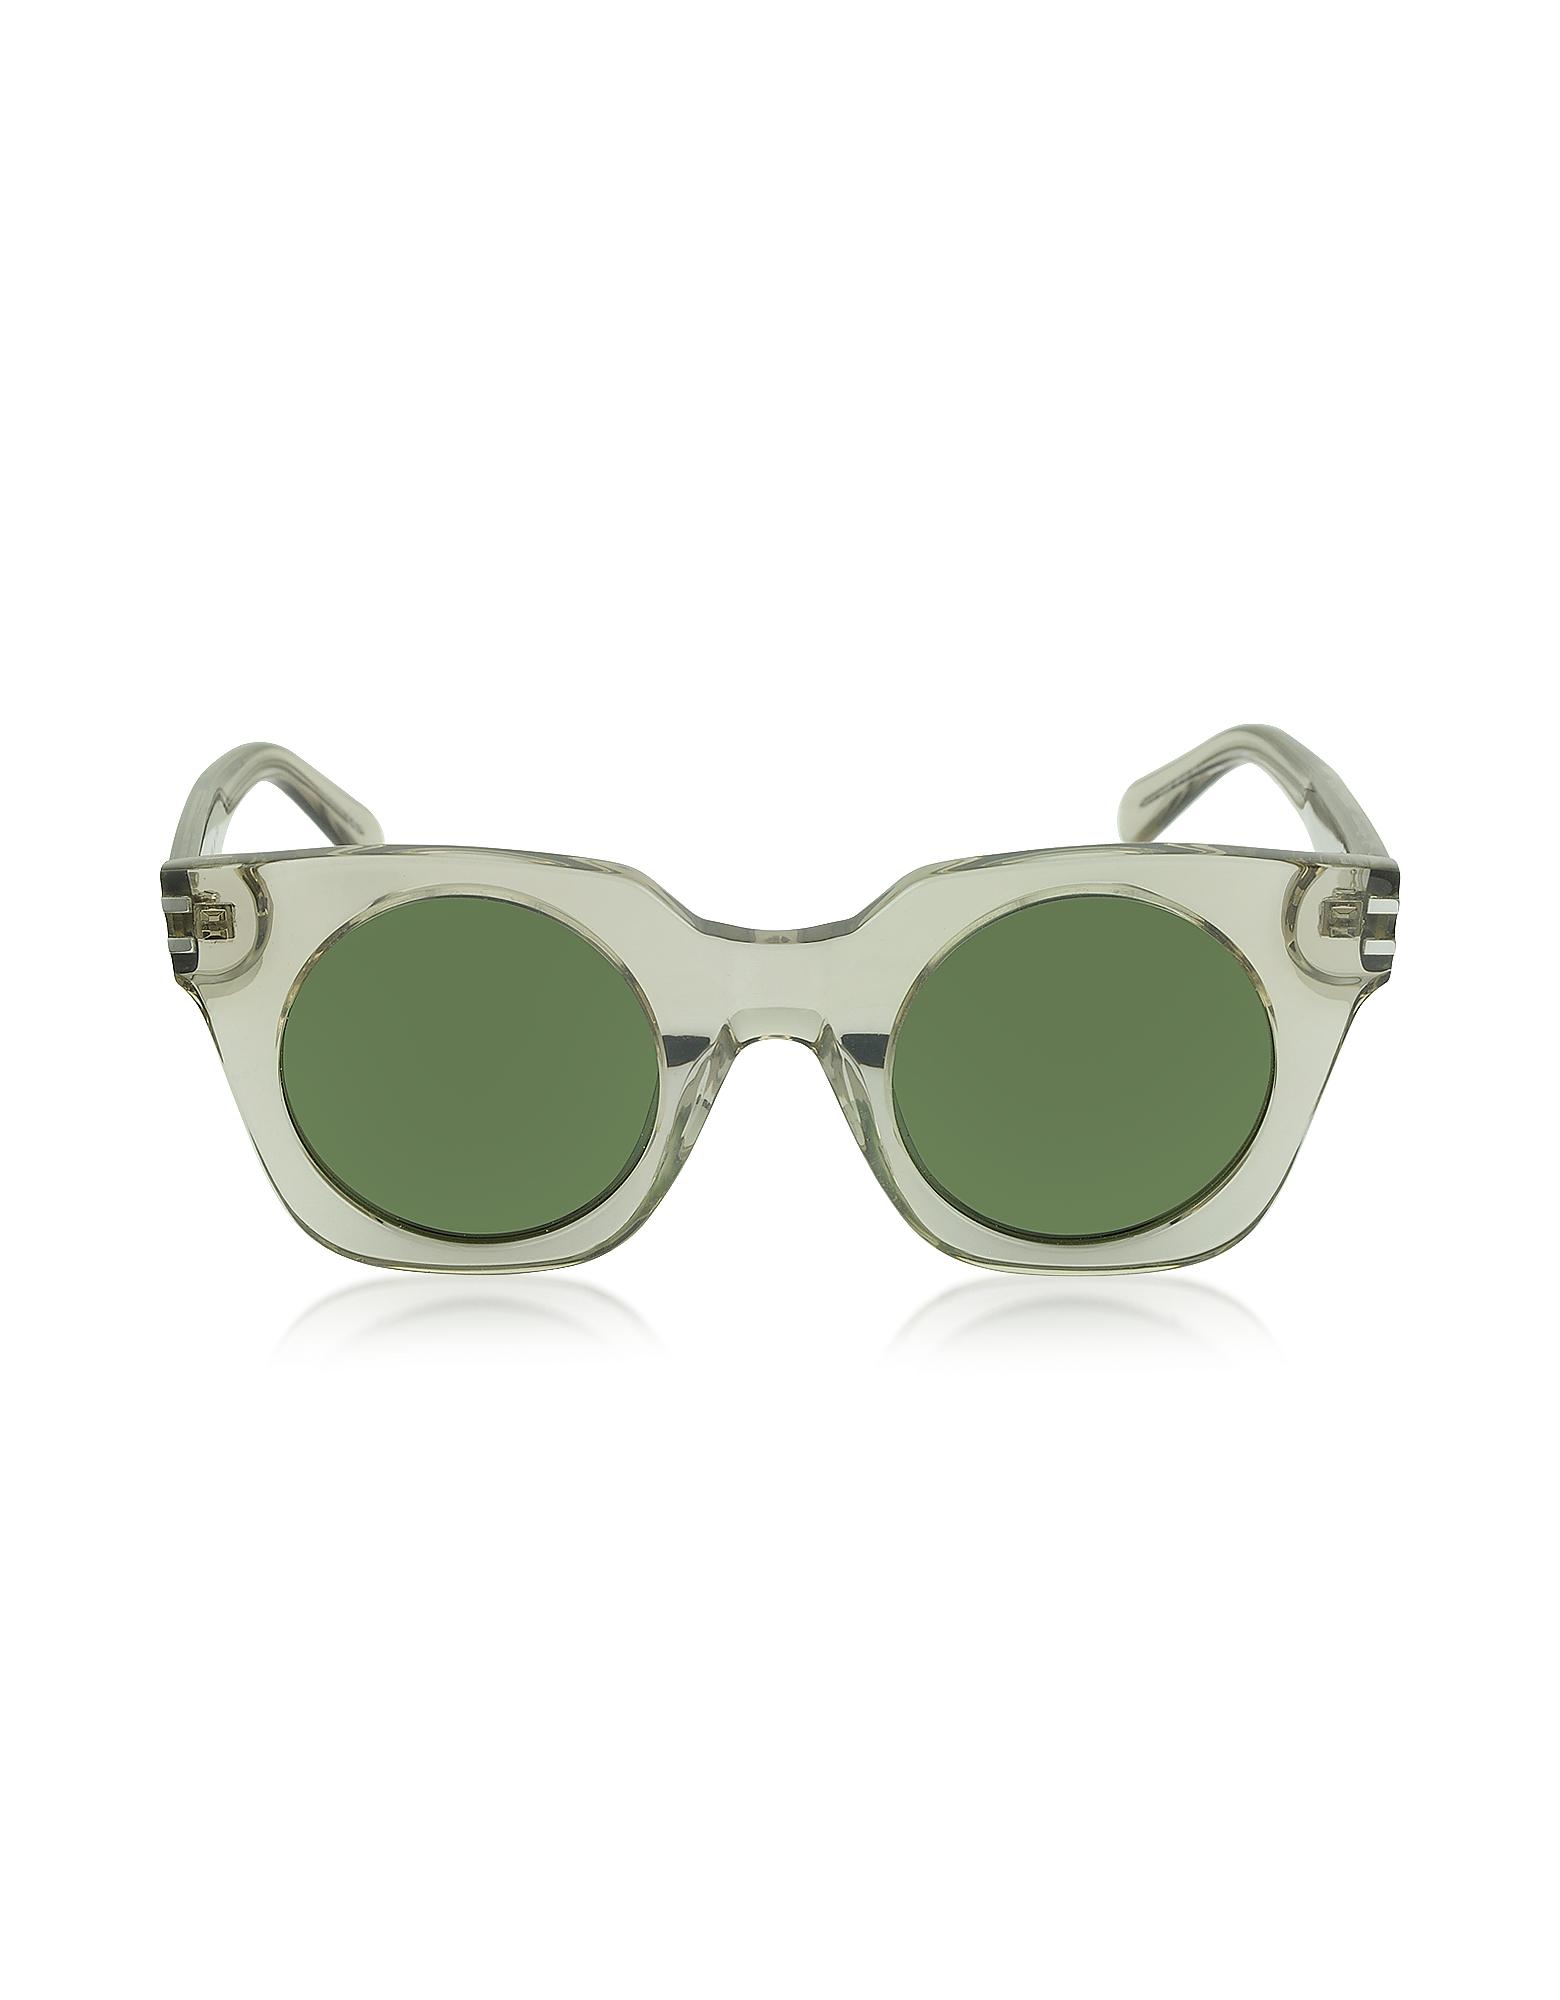 Marc Jacobs Sunglasses, MJ 532/S Circle in a Square Acetate Sunglasses